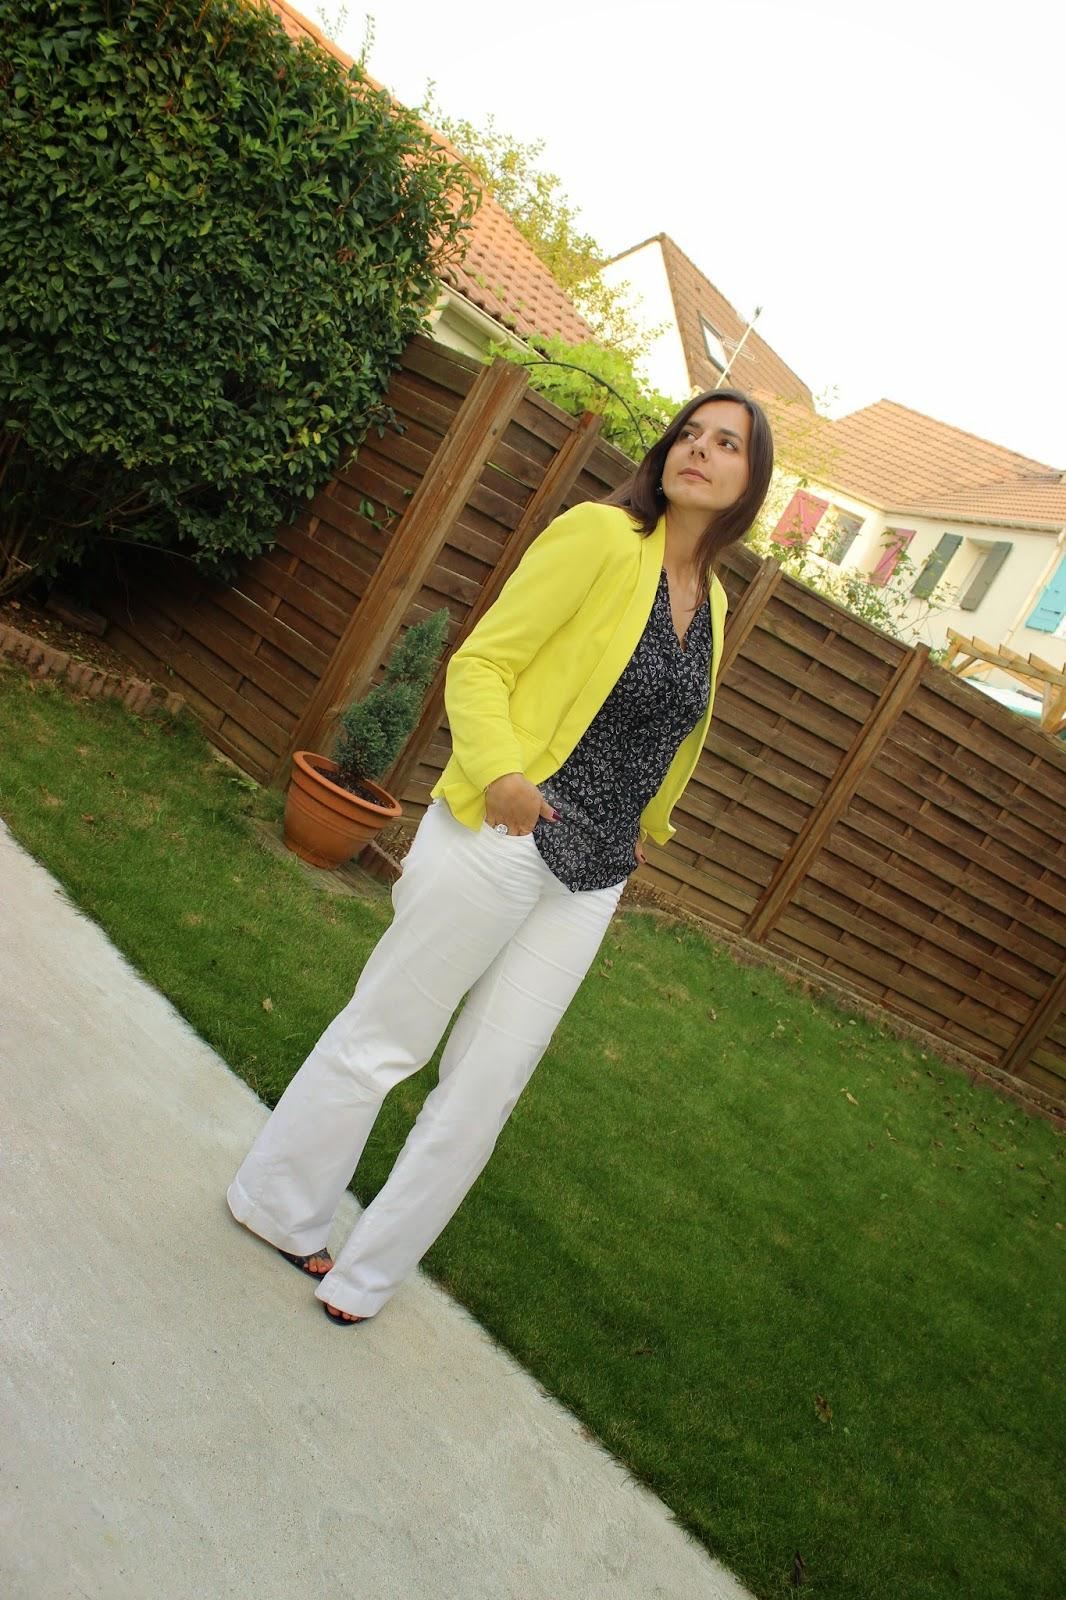 Veste jaune, pantalon blanc, chaussures bleues kookai